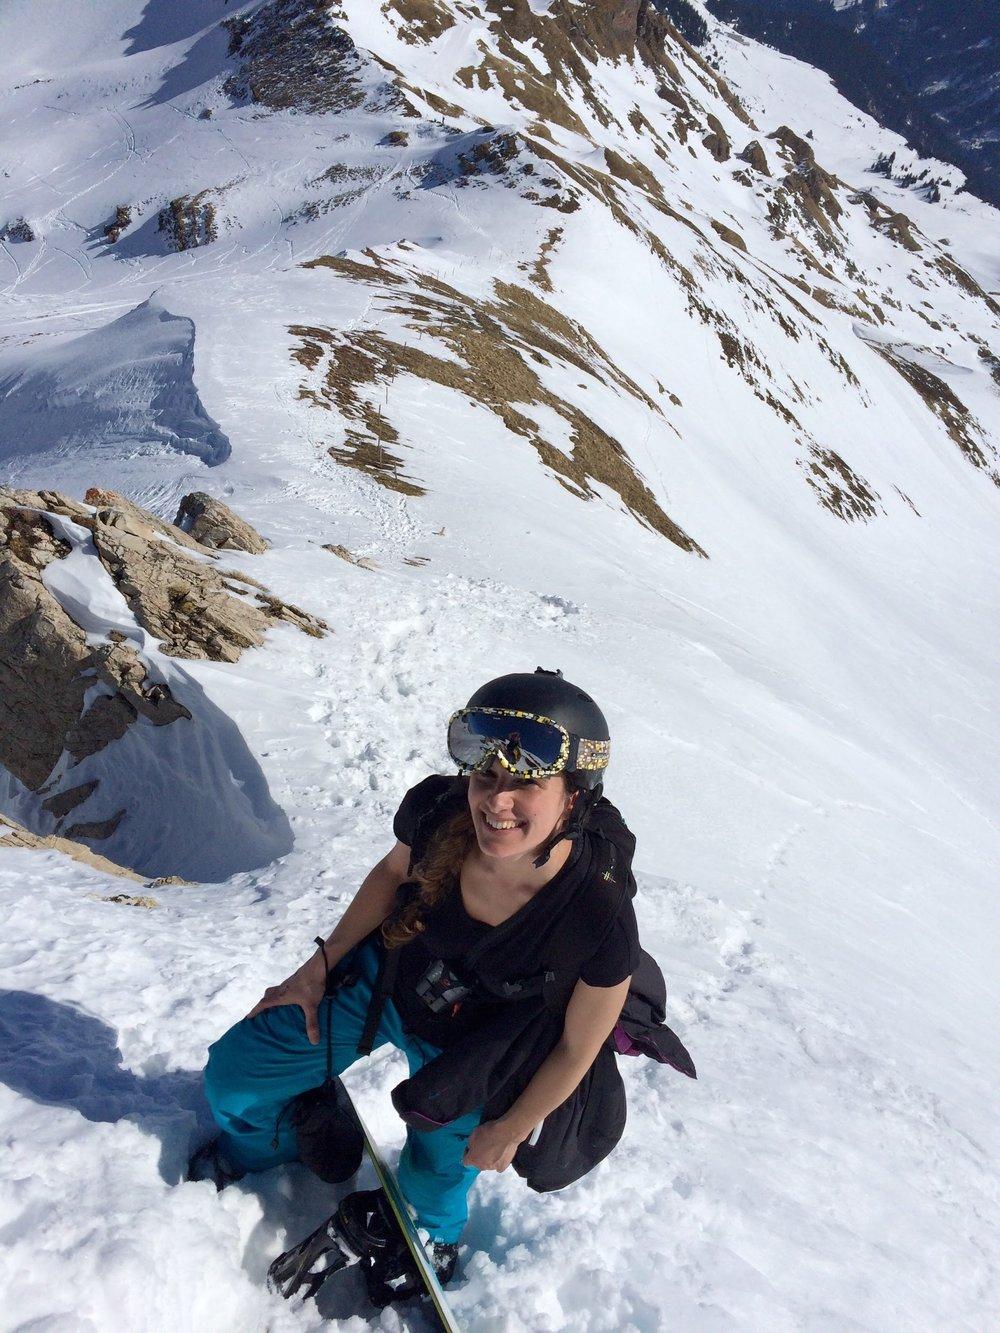 Backcountry snowboarding in Flumserberg, Switzerland.